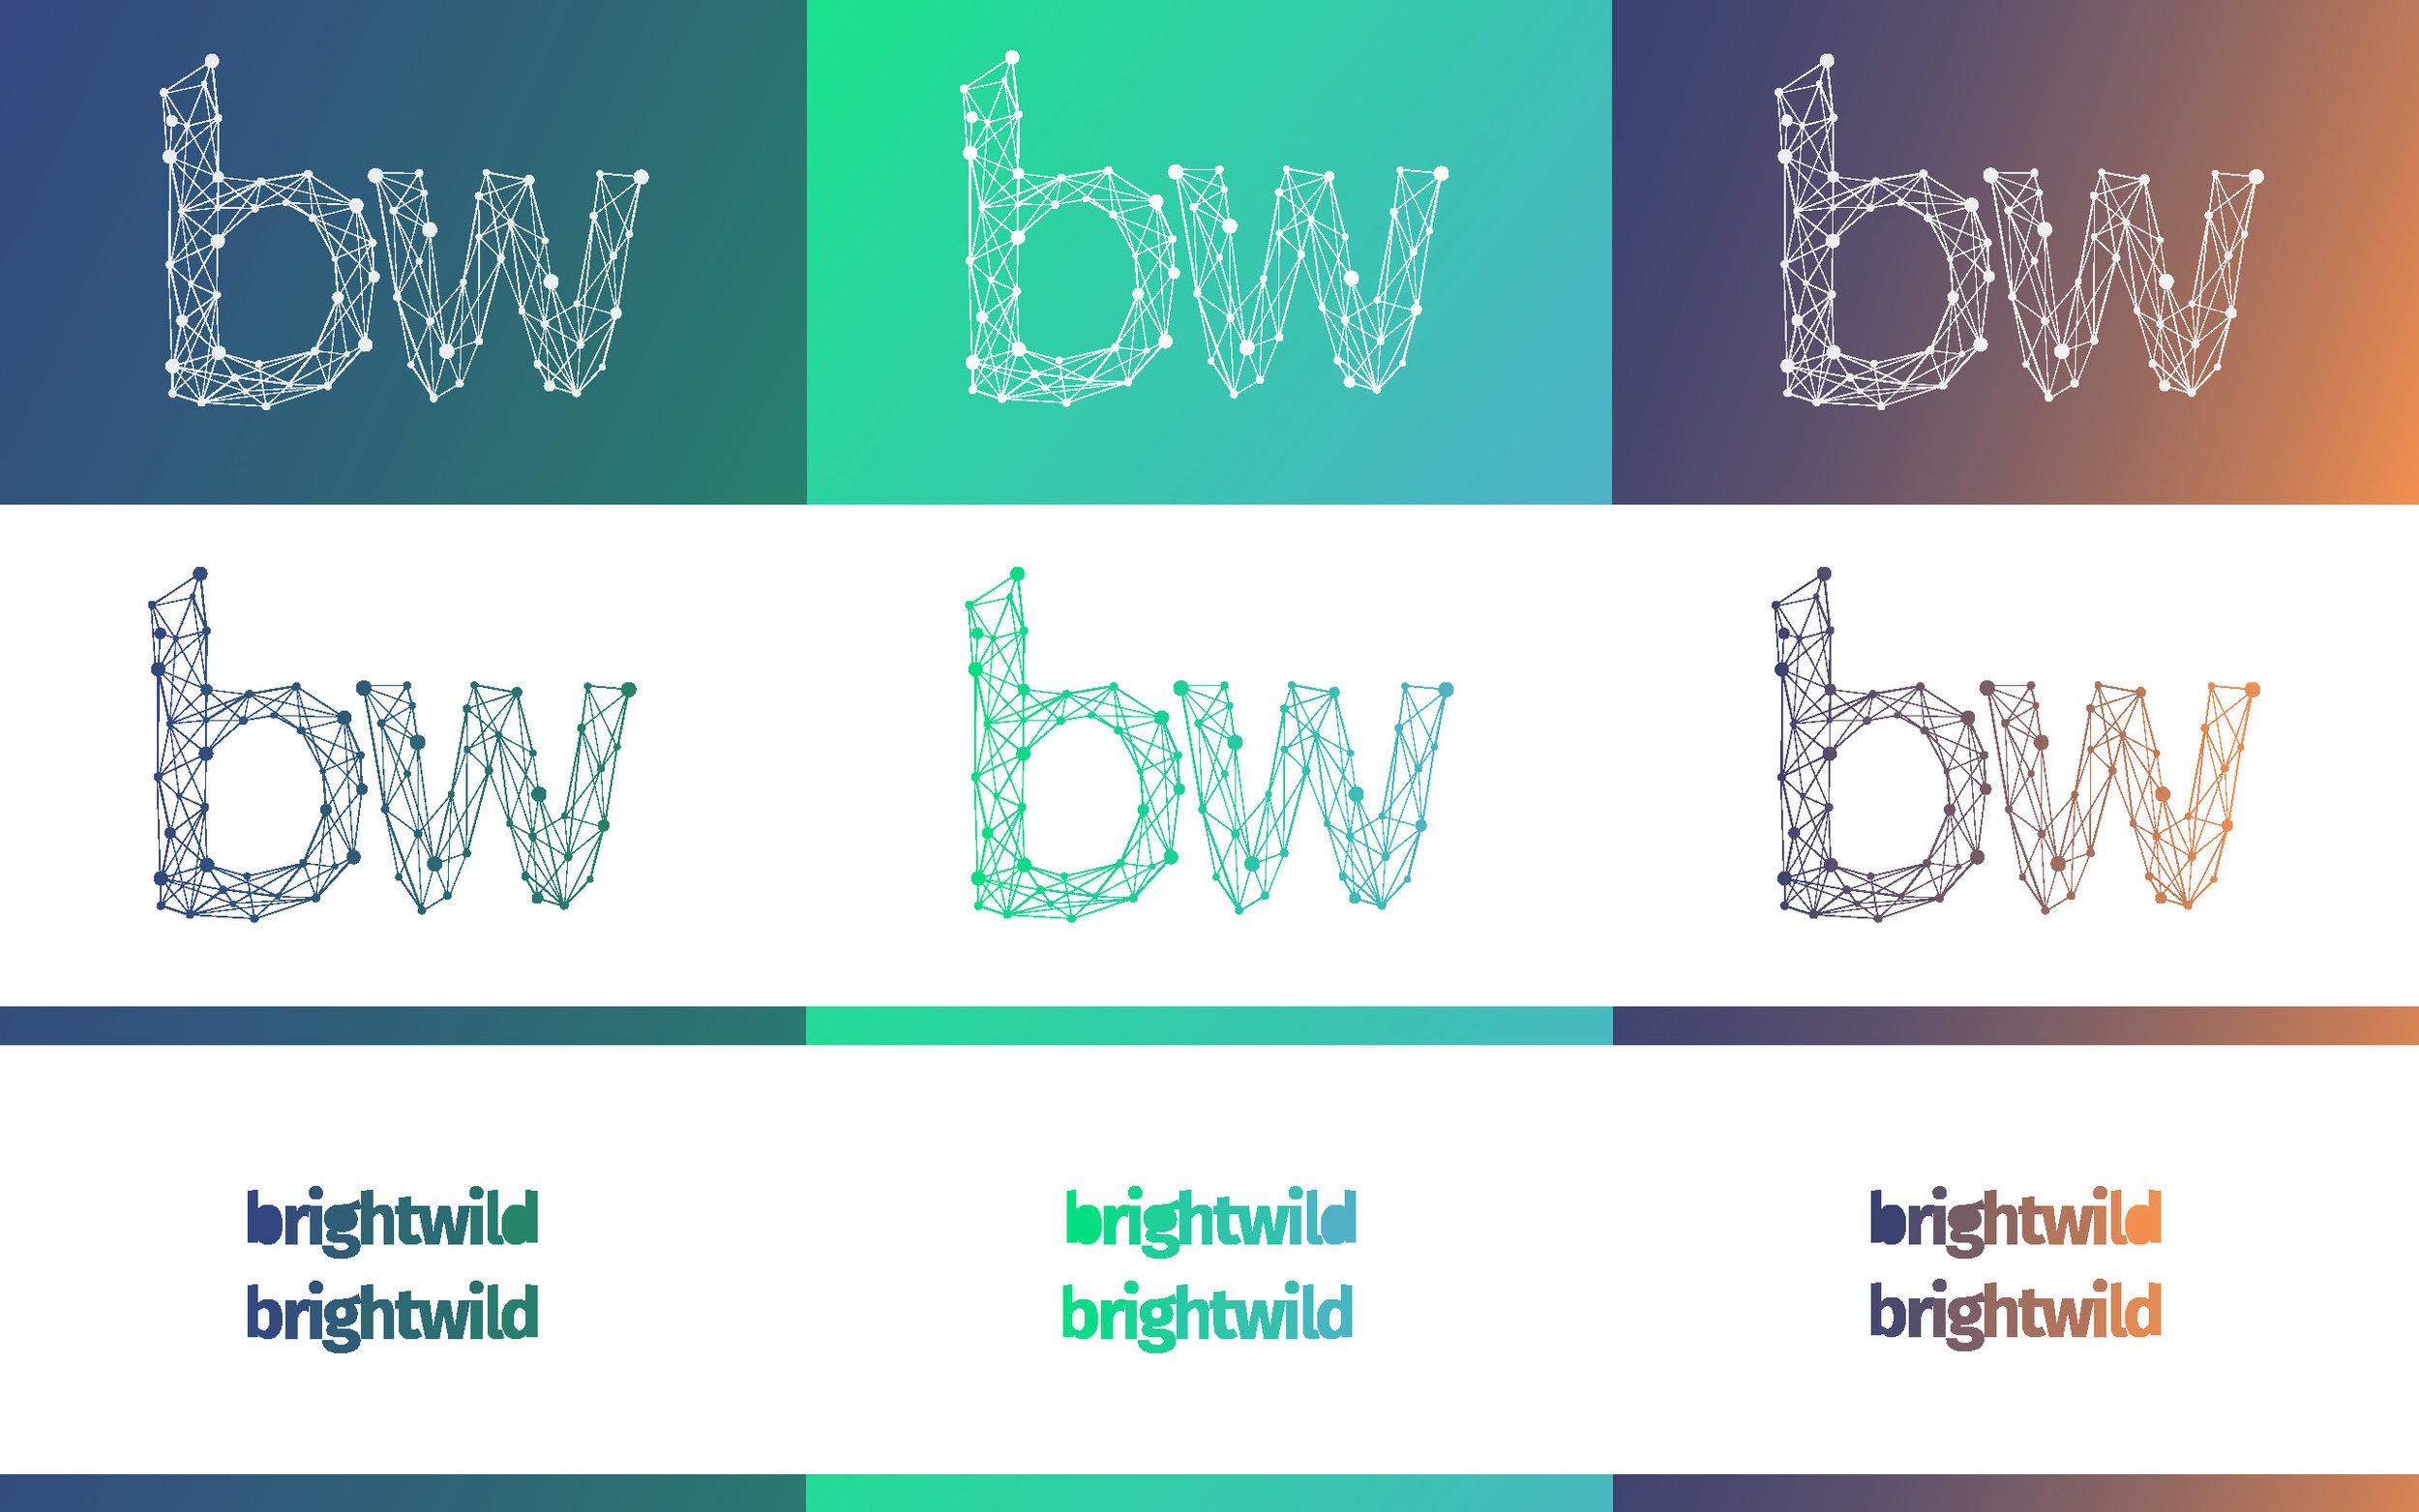 colour_options_brightwild.jpg